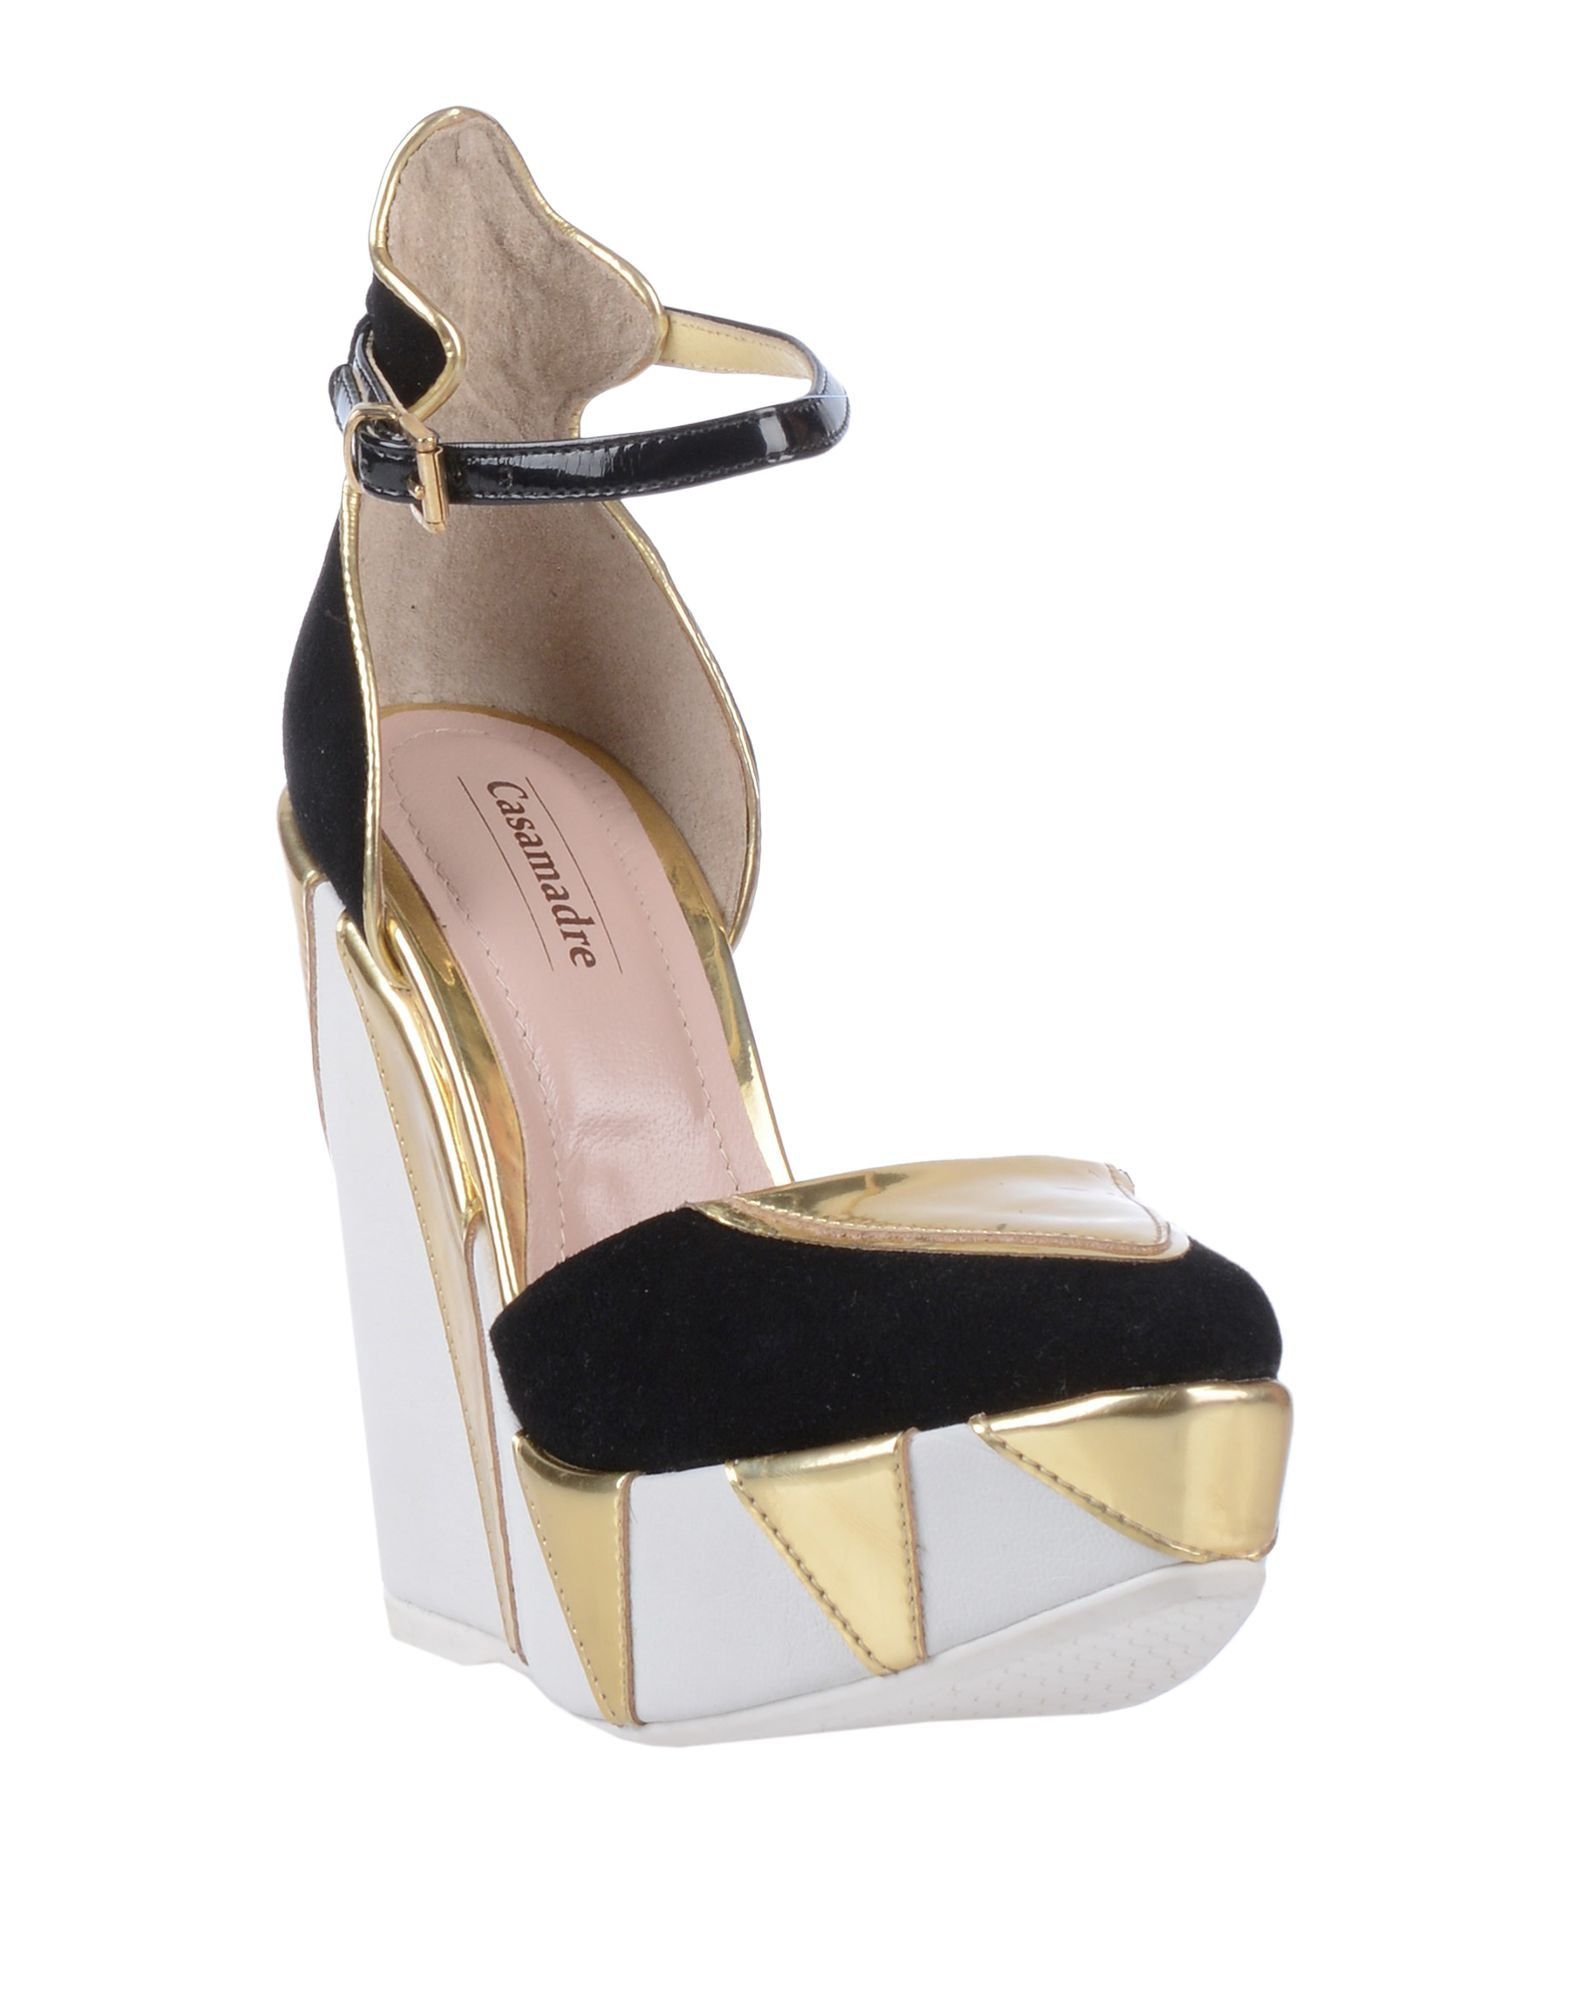 Stilvolle Damen billige Schuhe Casamadre Pumps Damen Stilvolle  11533934DO 58f8f2